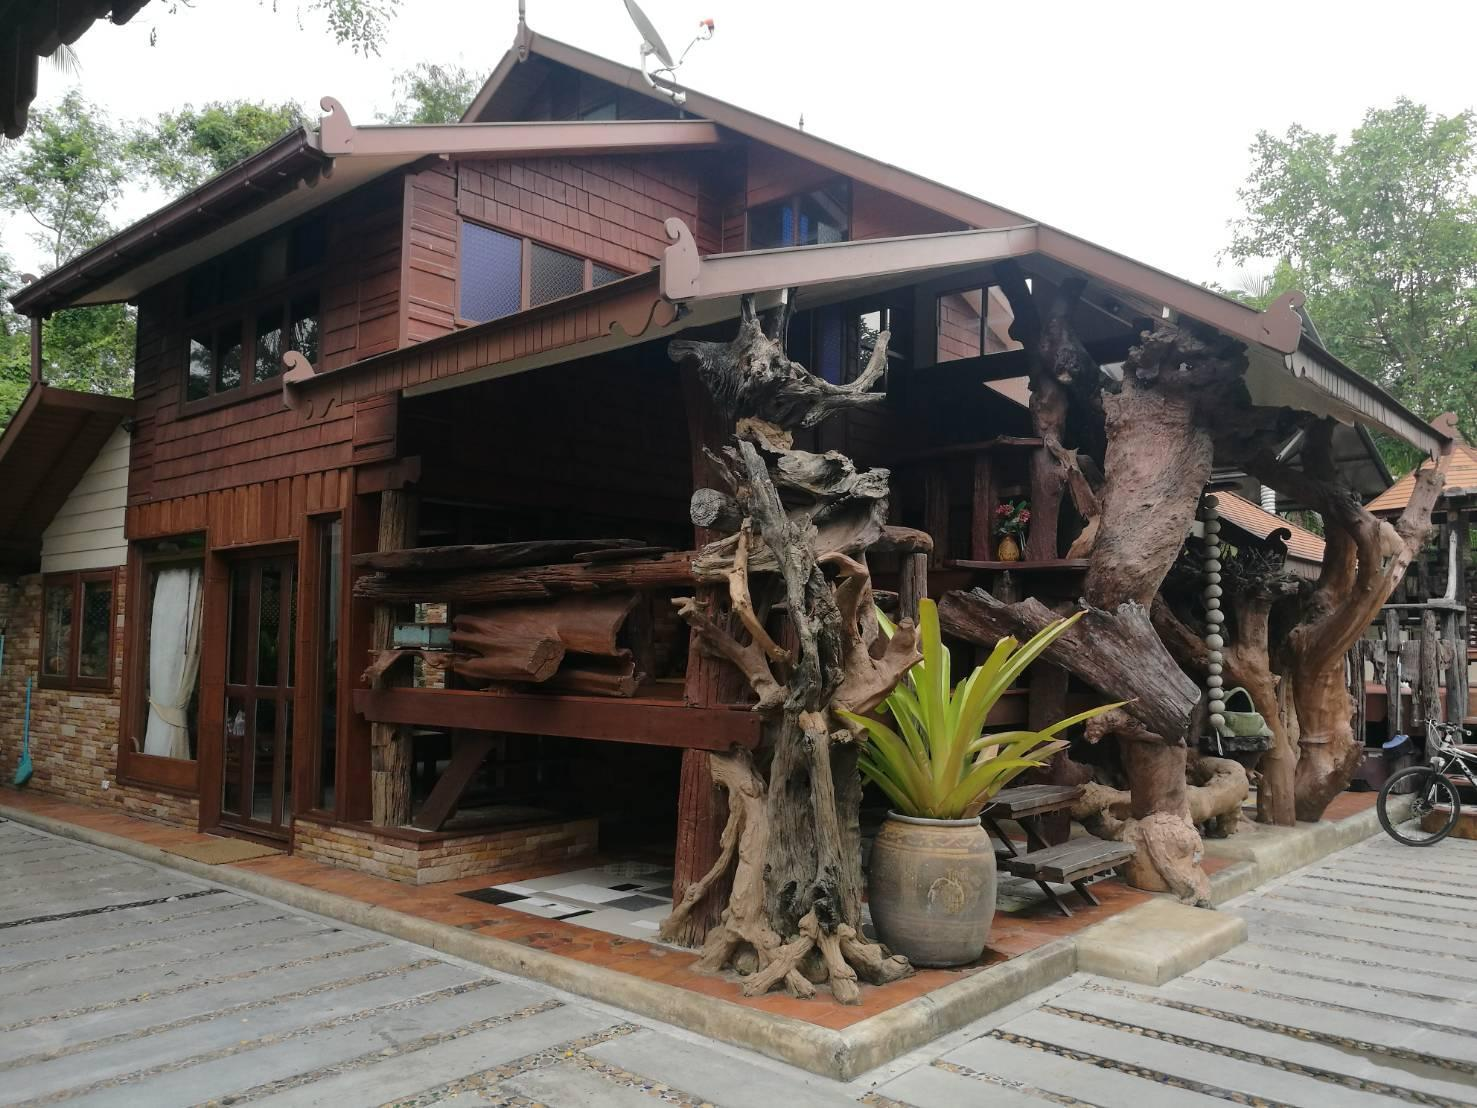 Suankaew Art Cottage (ReuanMhonkaew) 2 ห้องนอน 2 ห้องน้ำส่วนตัว ขนาด 70 ตร.ม. – ศรีราชา